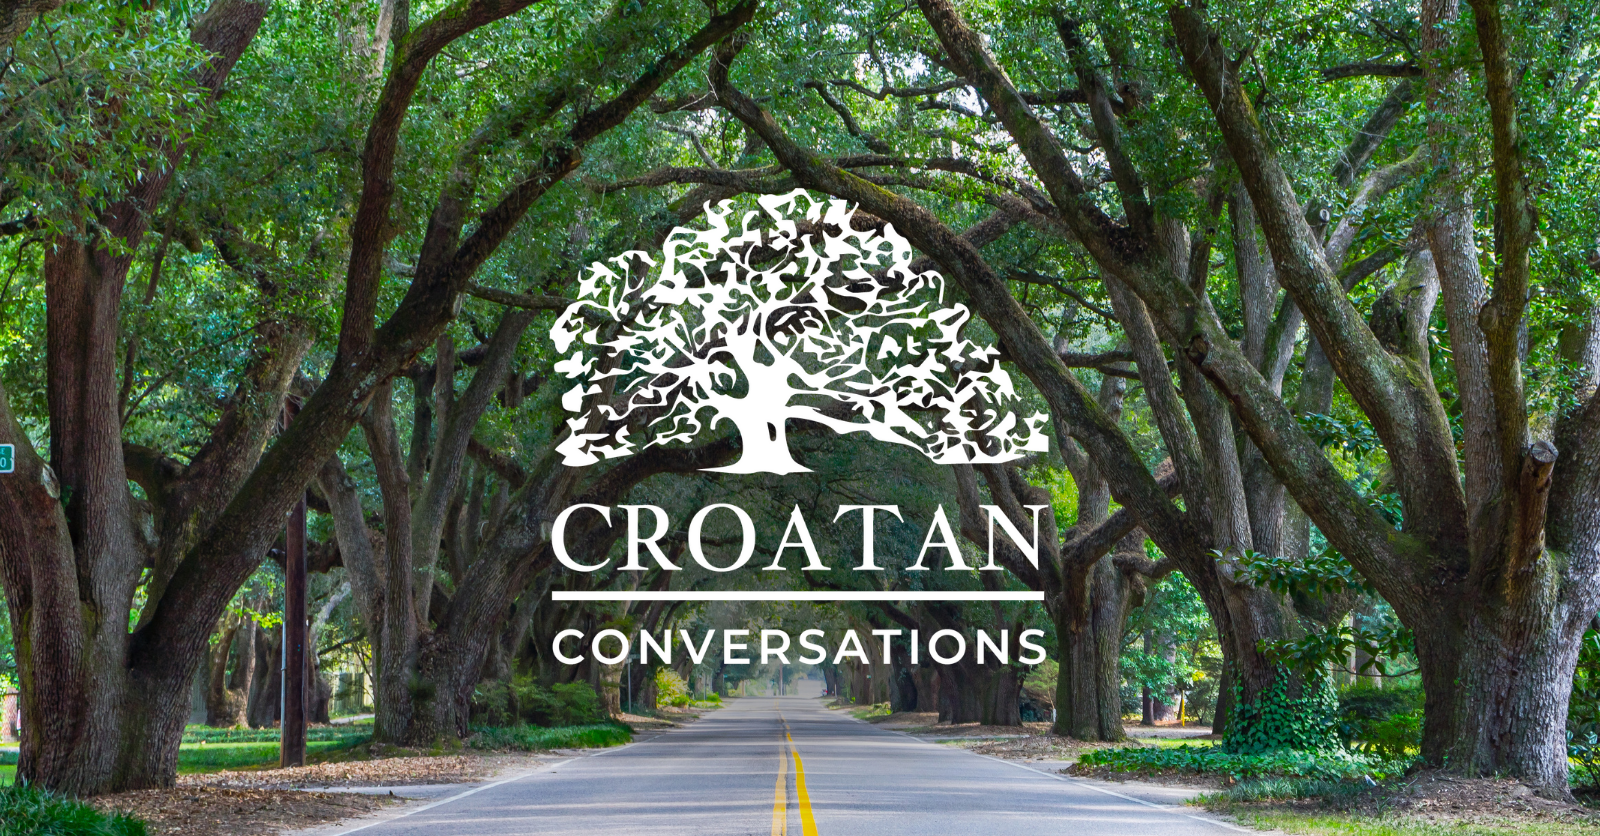 Croatan Conversations